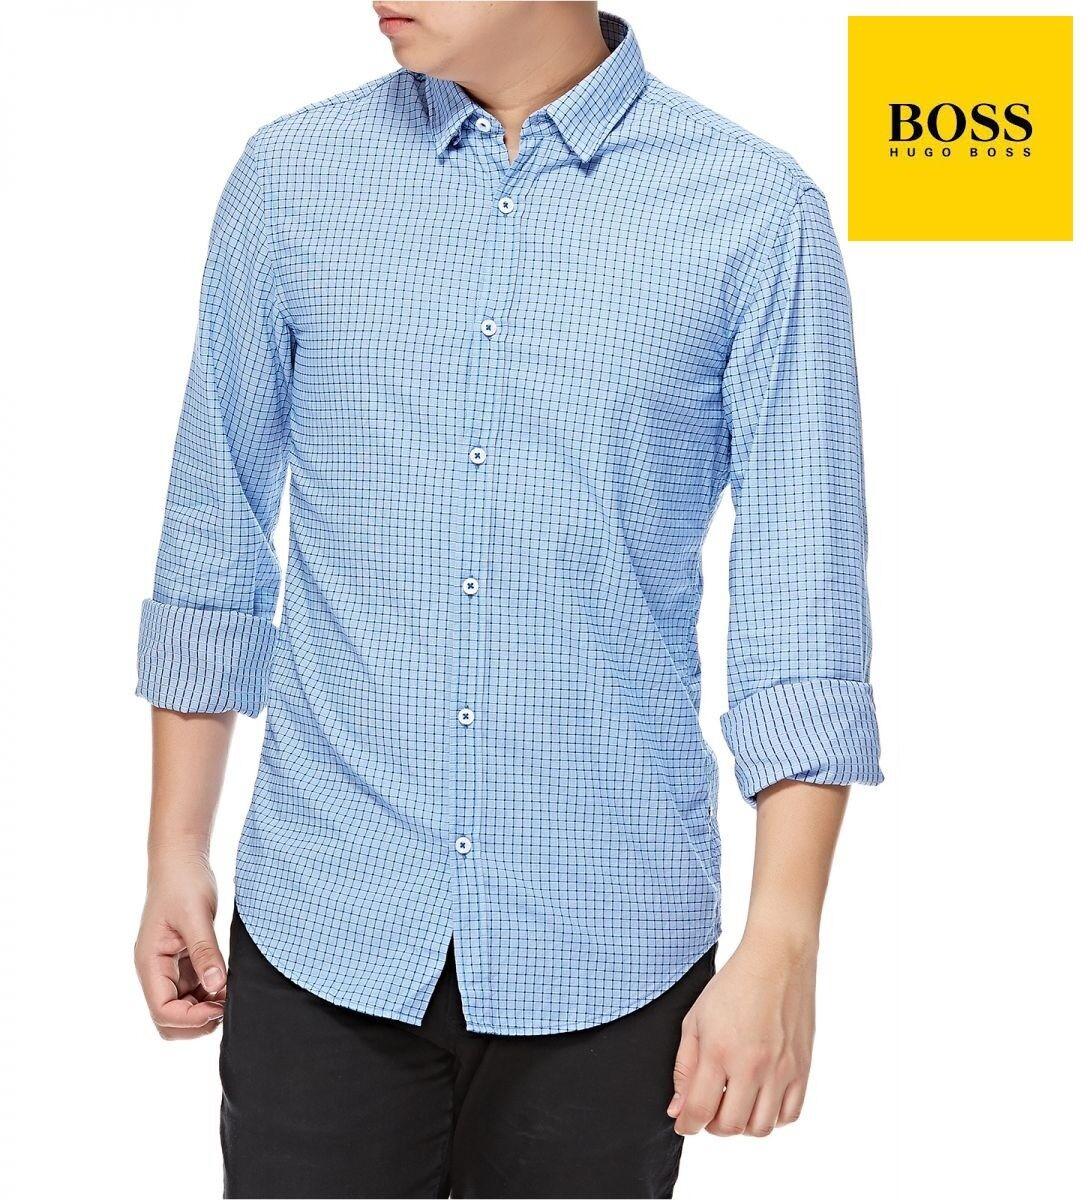 Hugo Boss Men's casual 100% Cotton Button Down Shirt in Light bluee